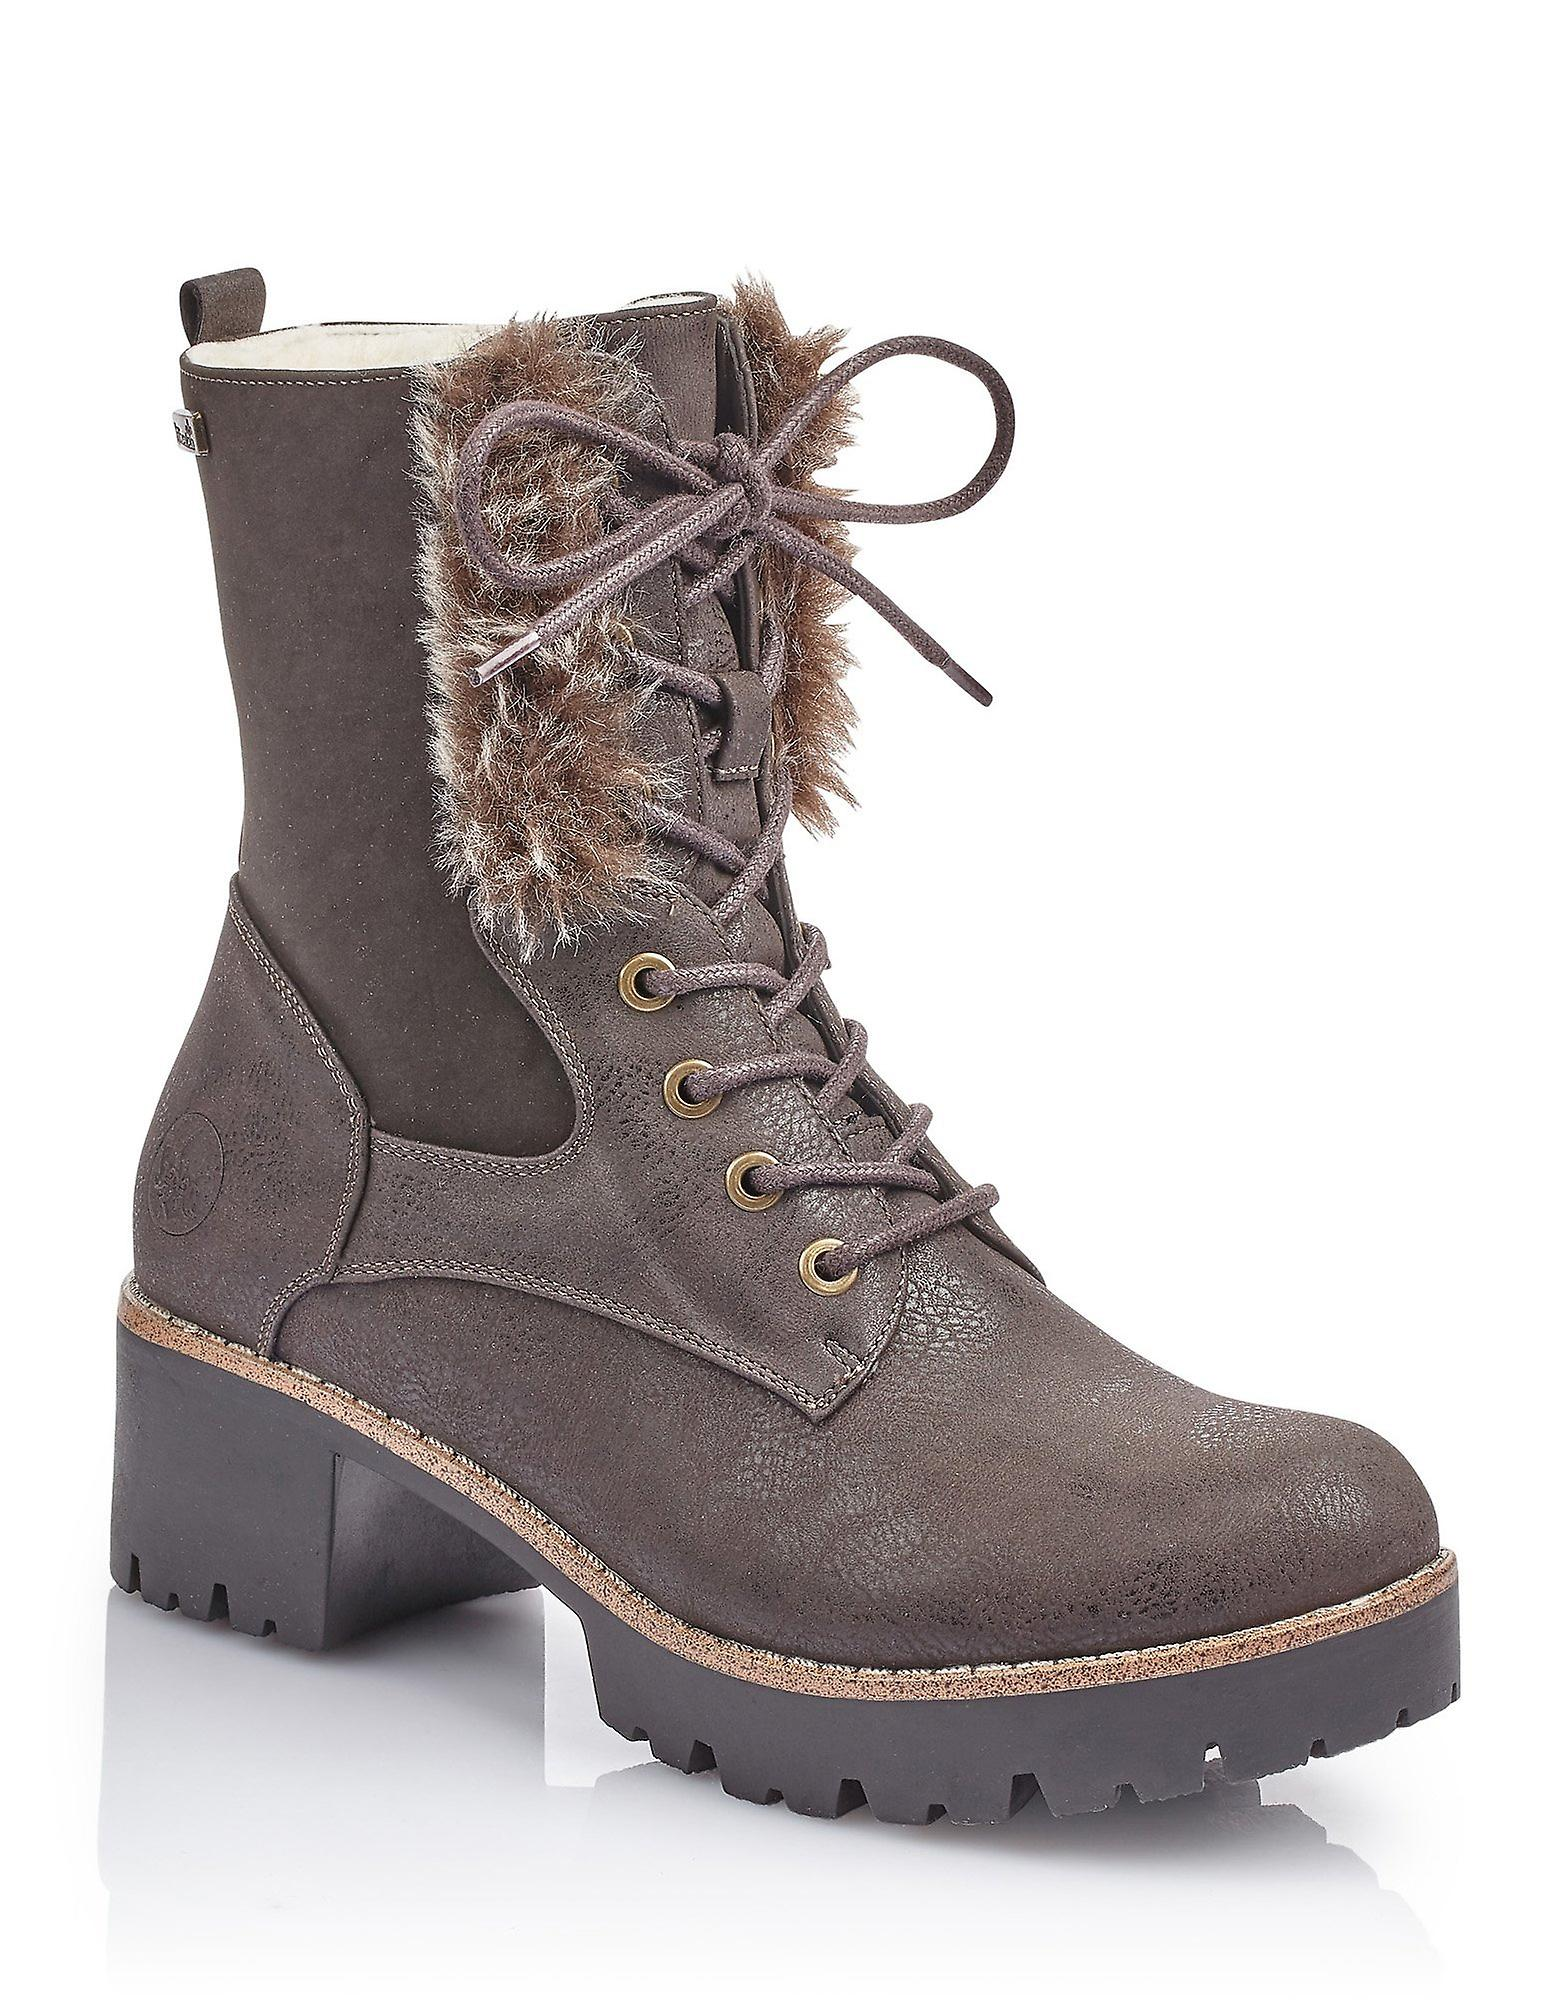 Rieker sandawe monteria rabbit boots womens brown S460S